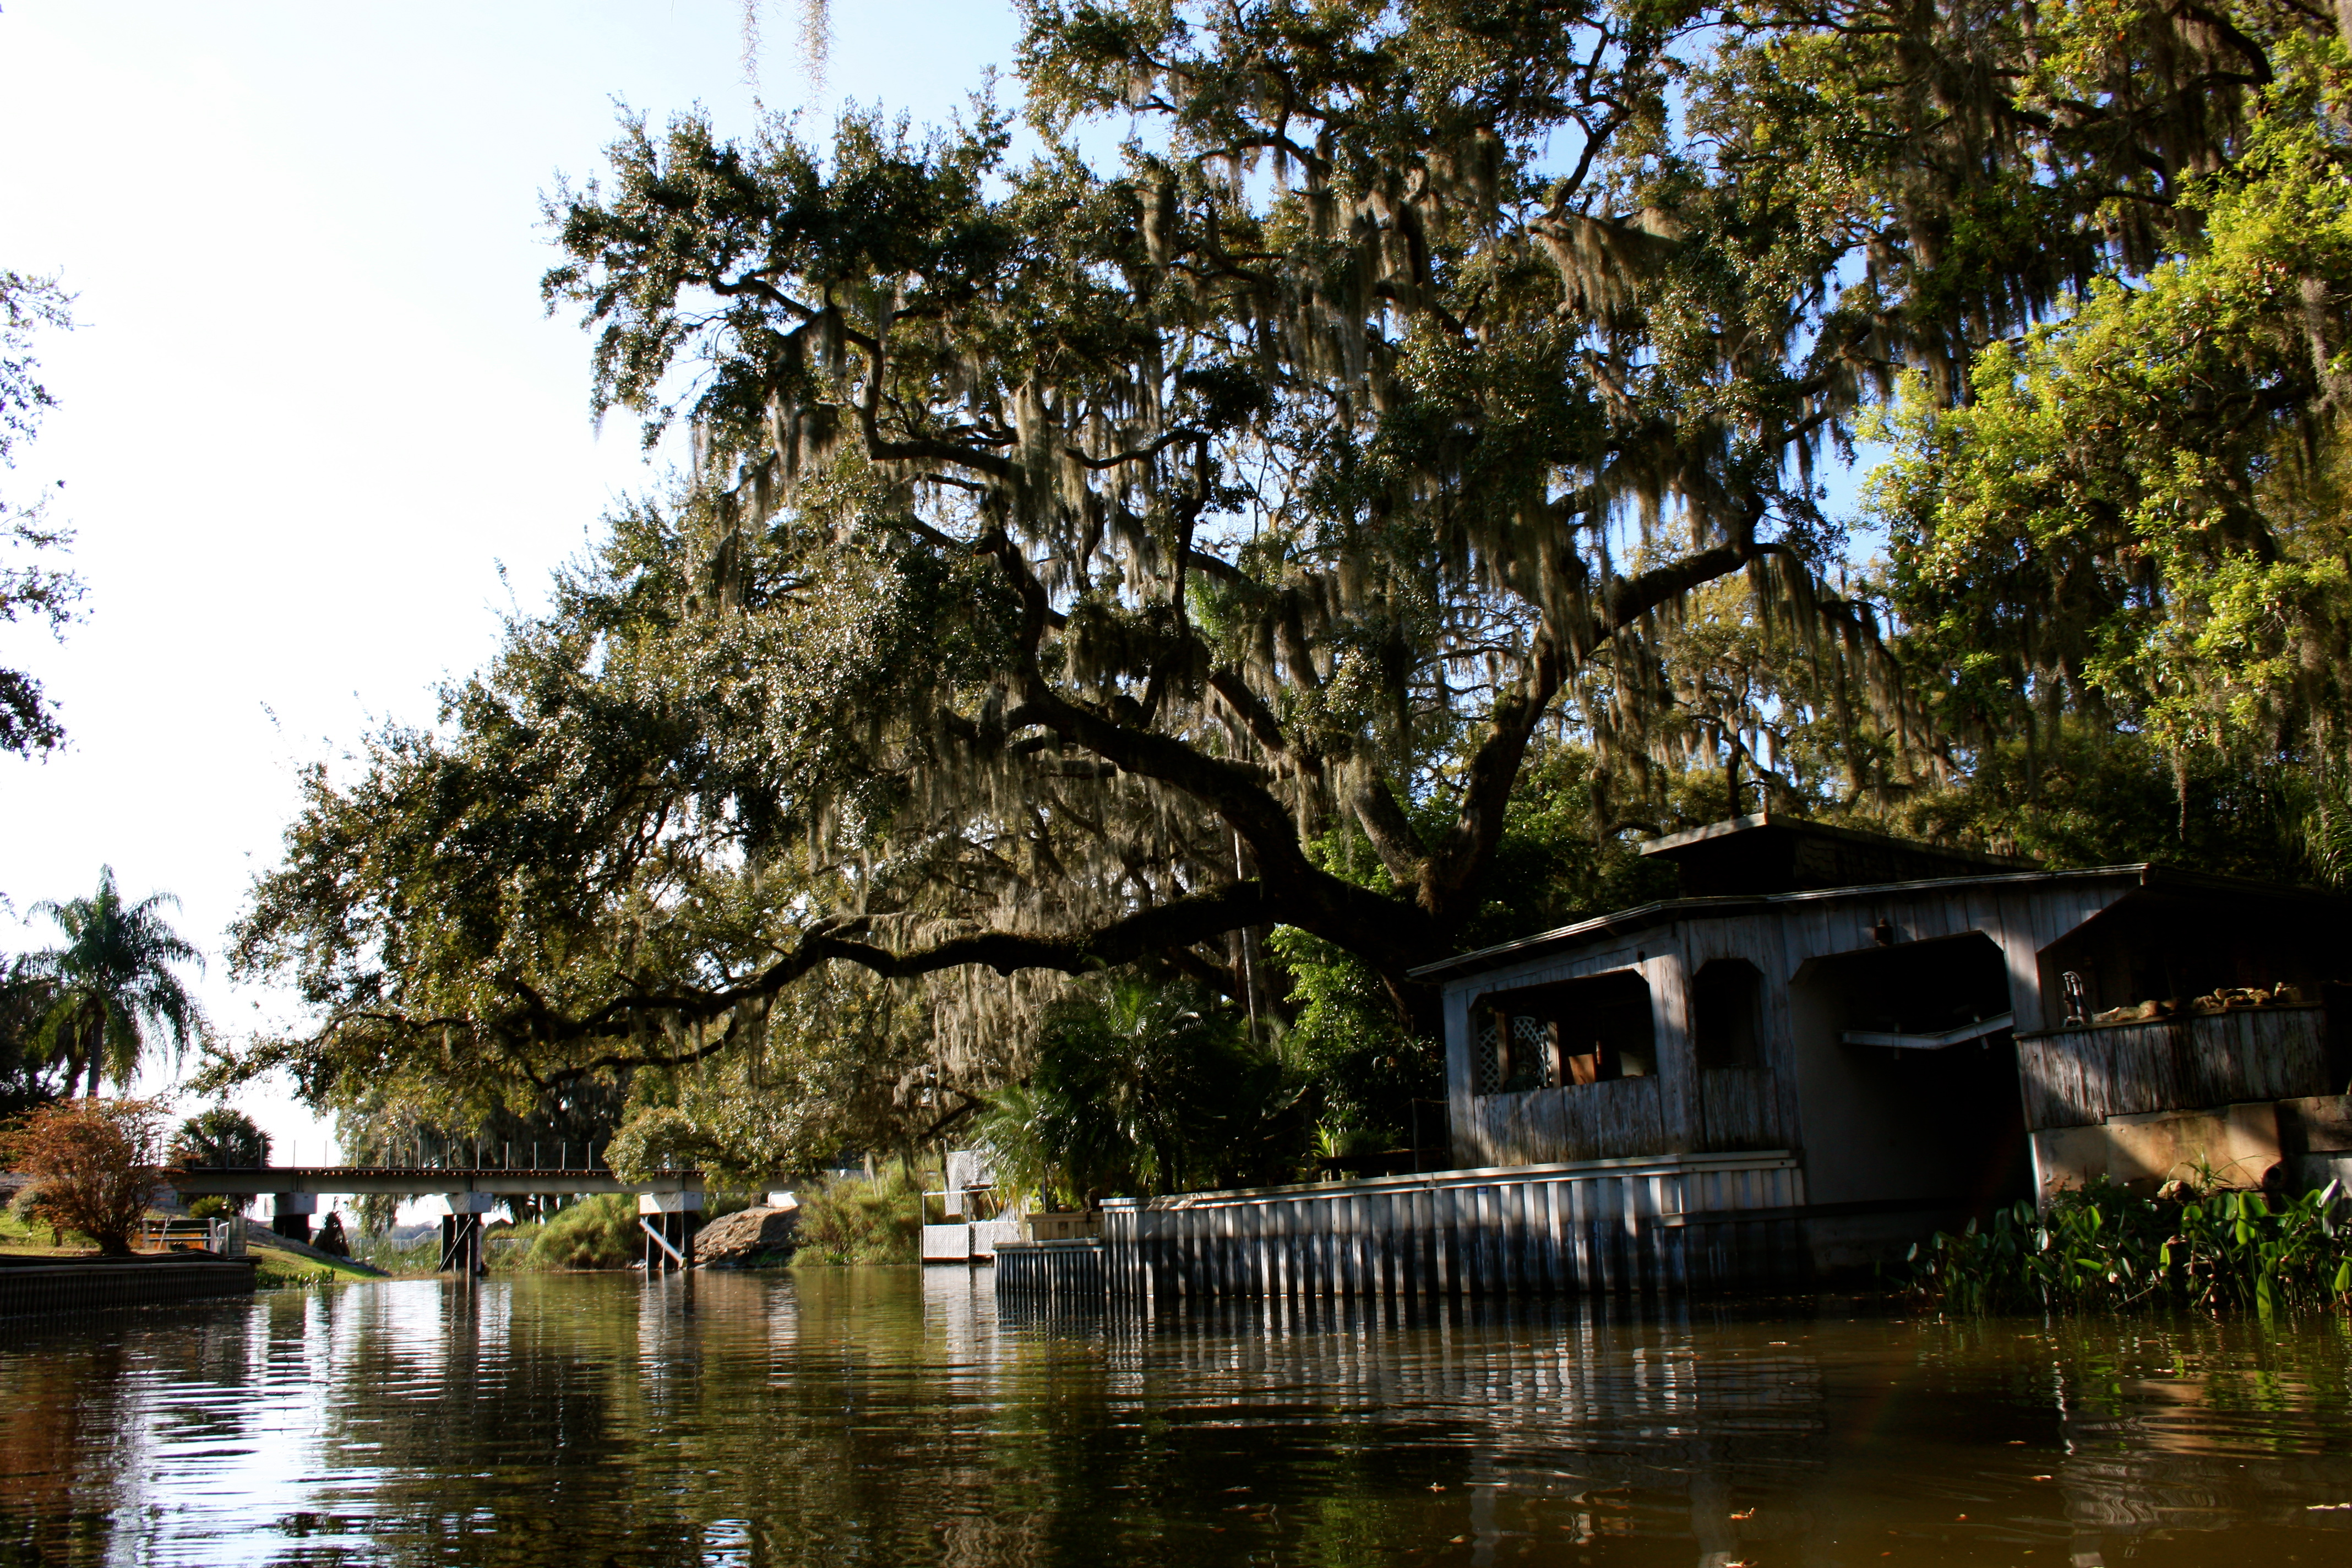 Dora Canal Boathouse